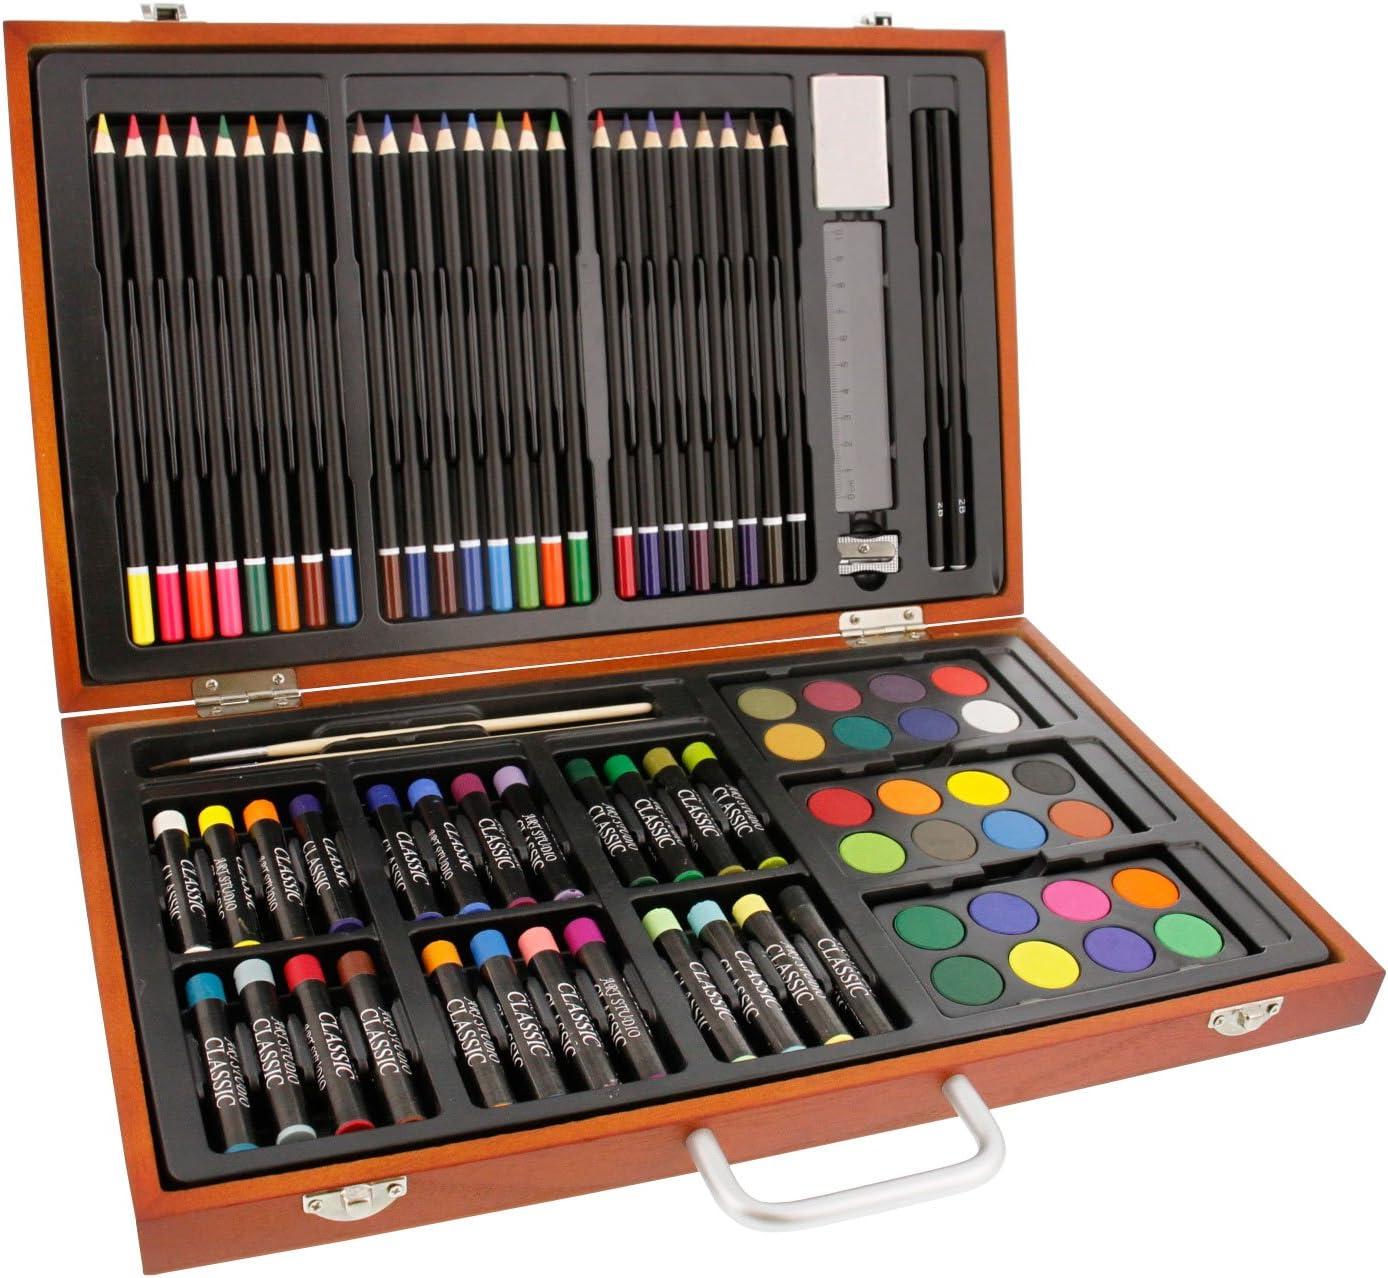 US Art Supply 82 Piece Deluxe Art Creativity Set in Wooden Case with BONUS 20